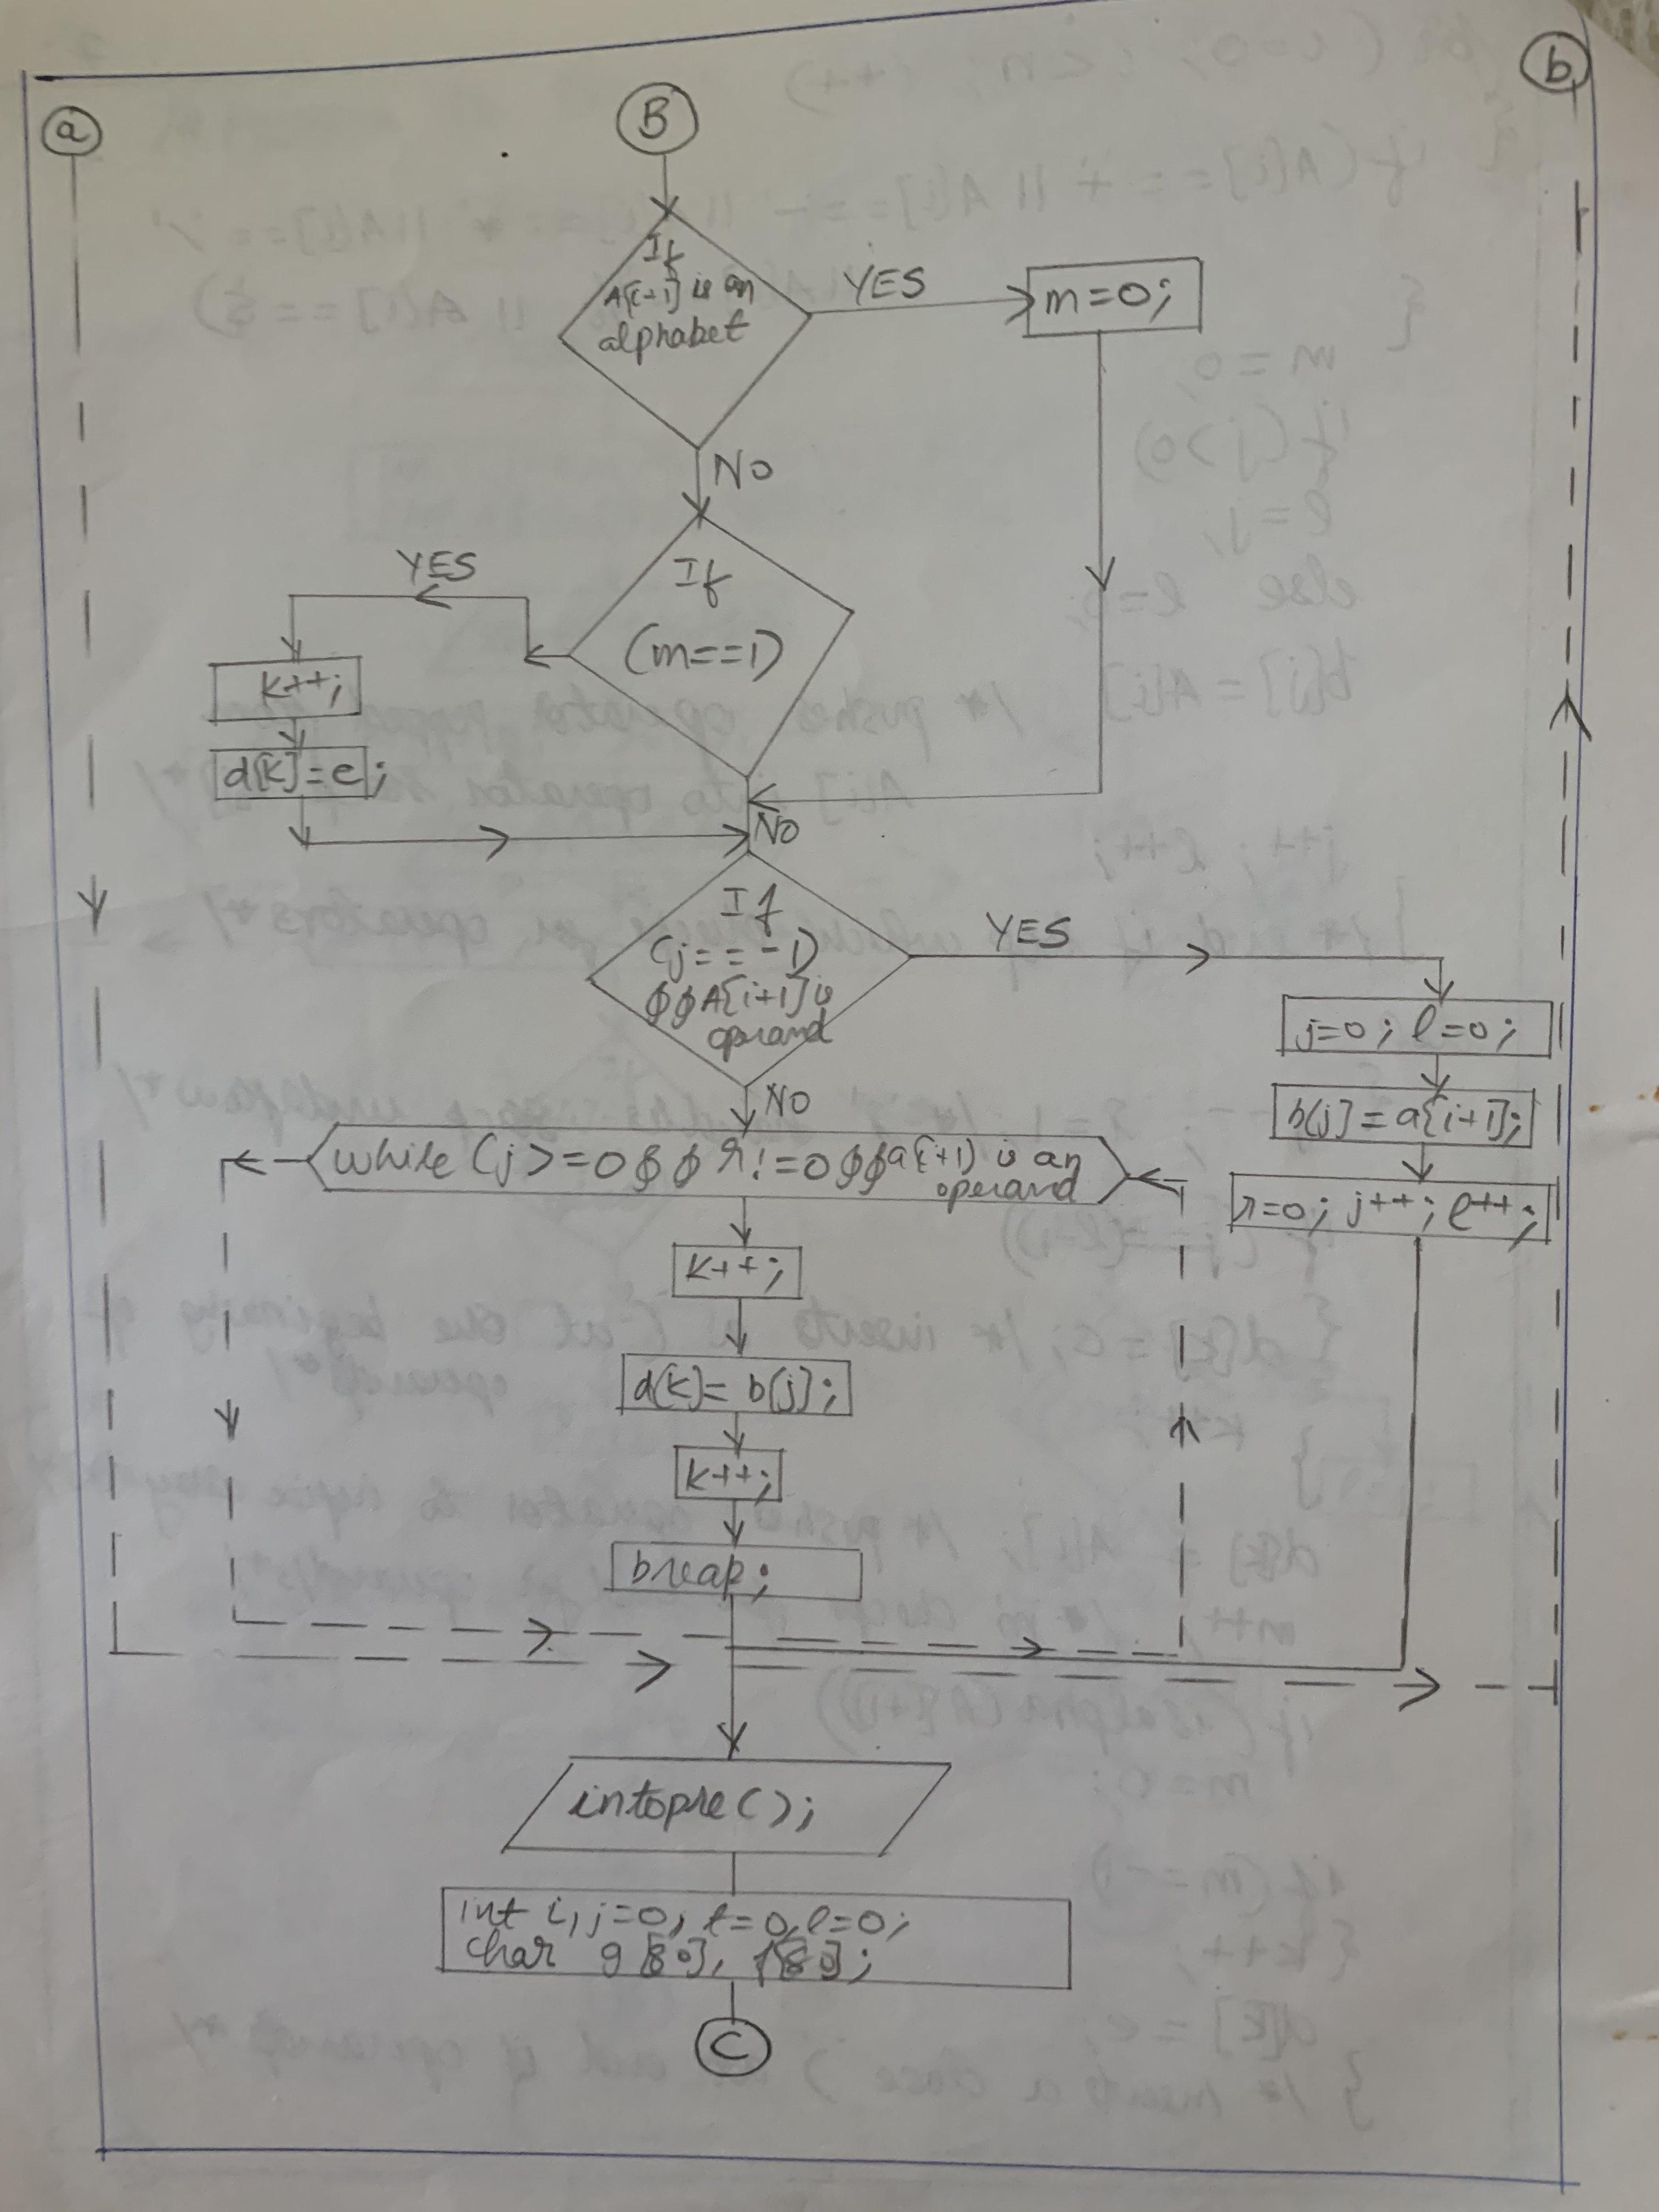 C program to convert a postfix string to prefix form